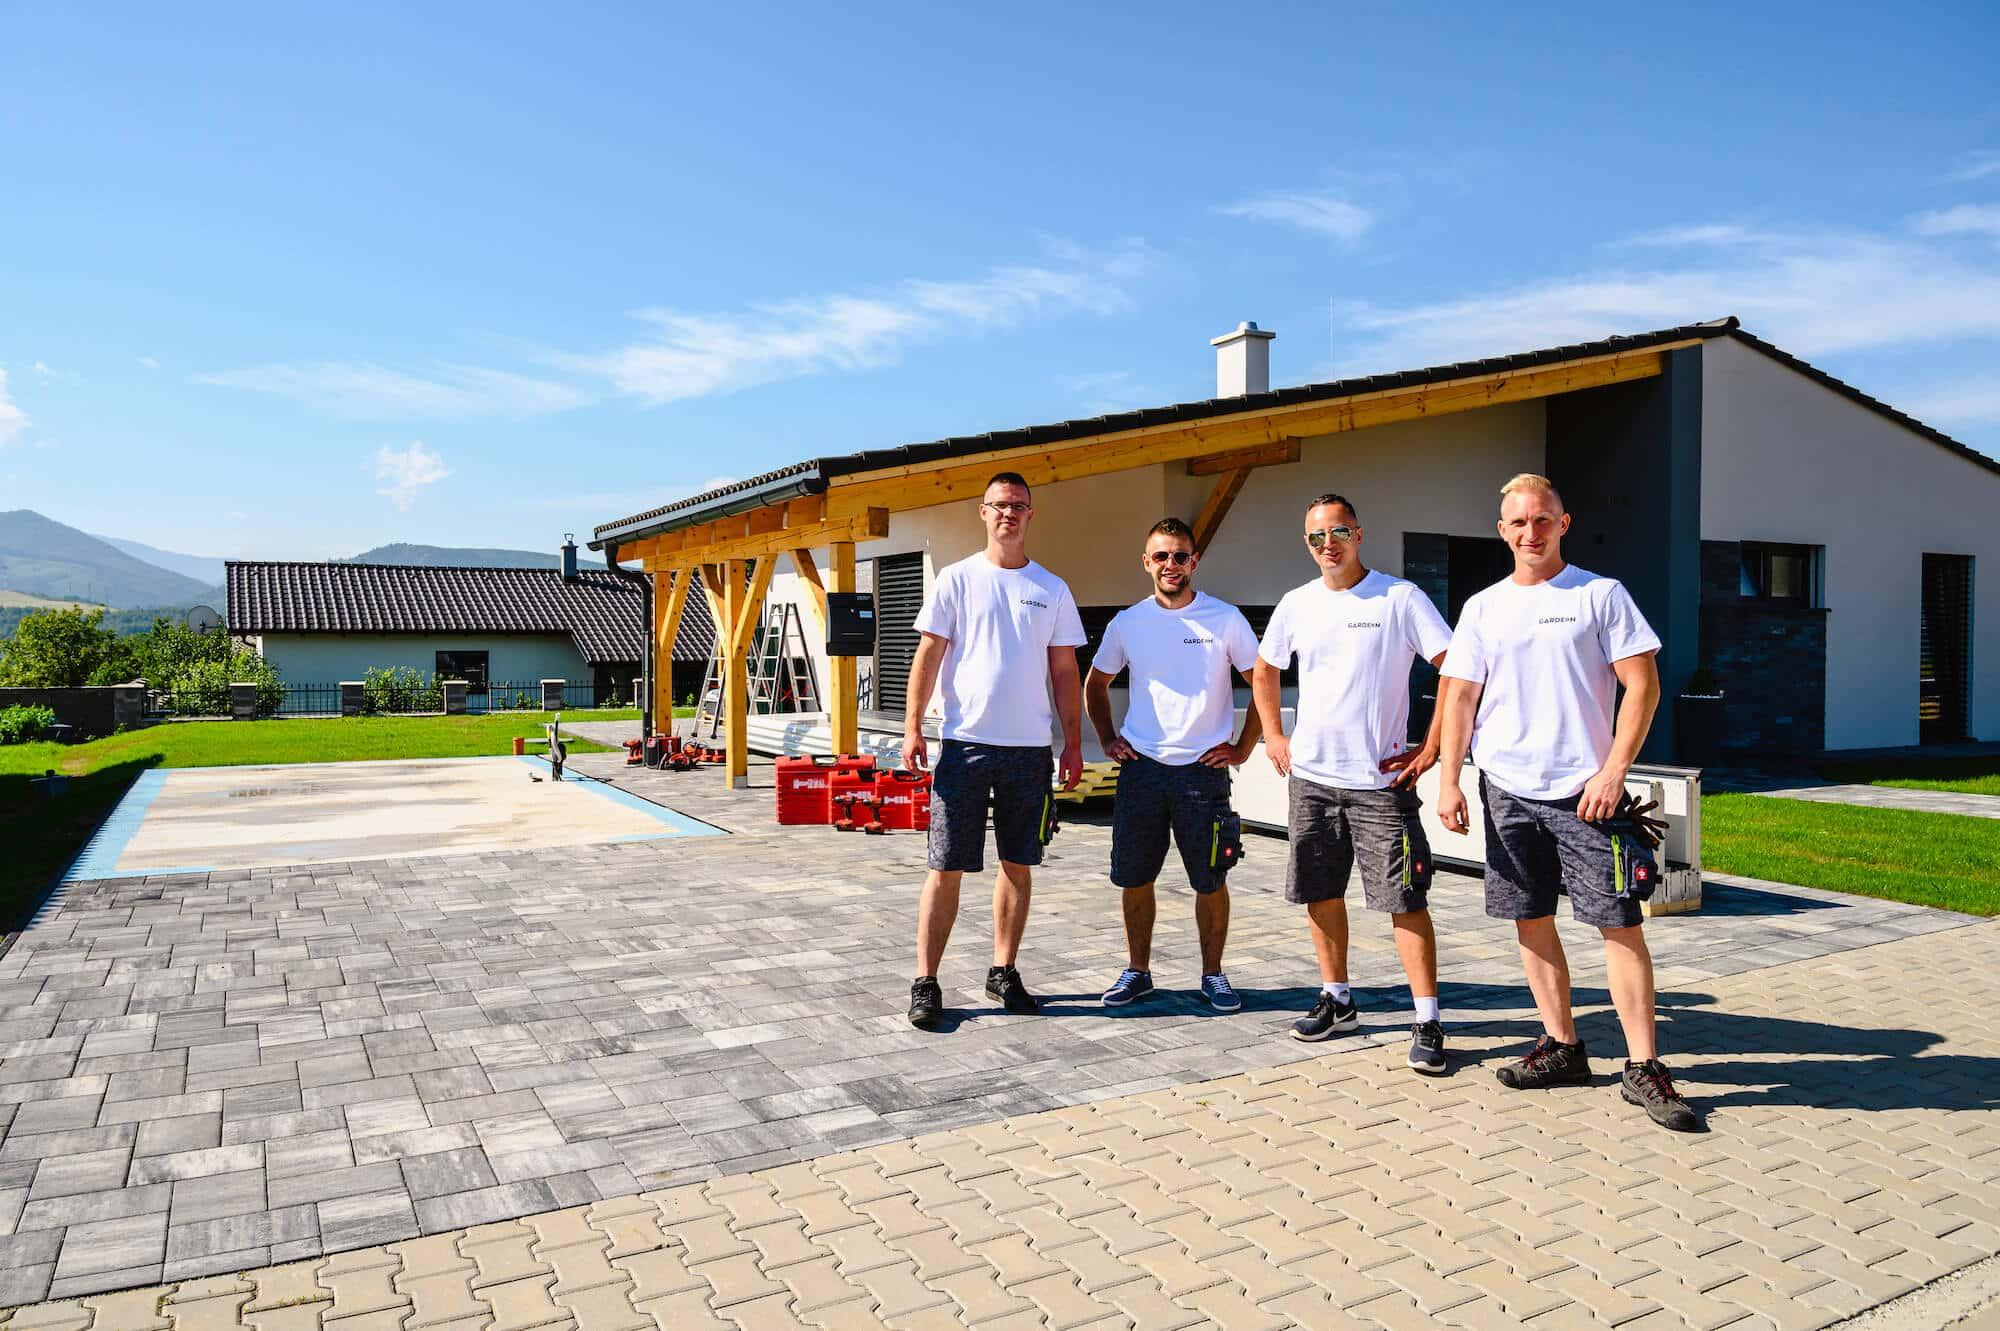 Martin Muller, Martin Solčány, Marek Jesenský, Maroš Švec